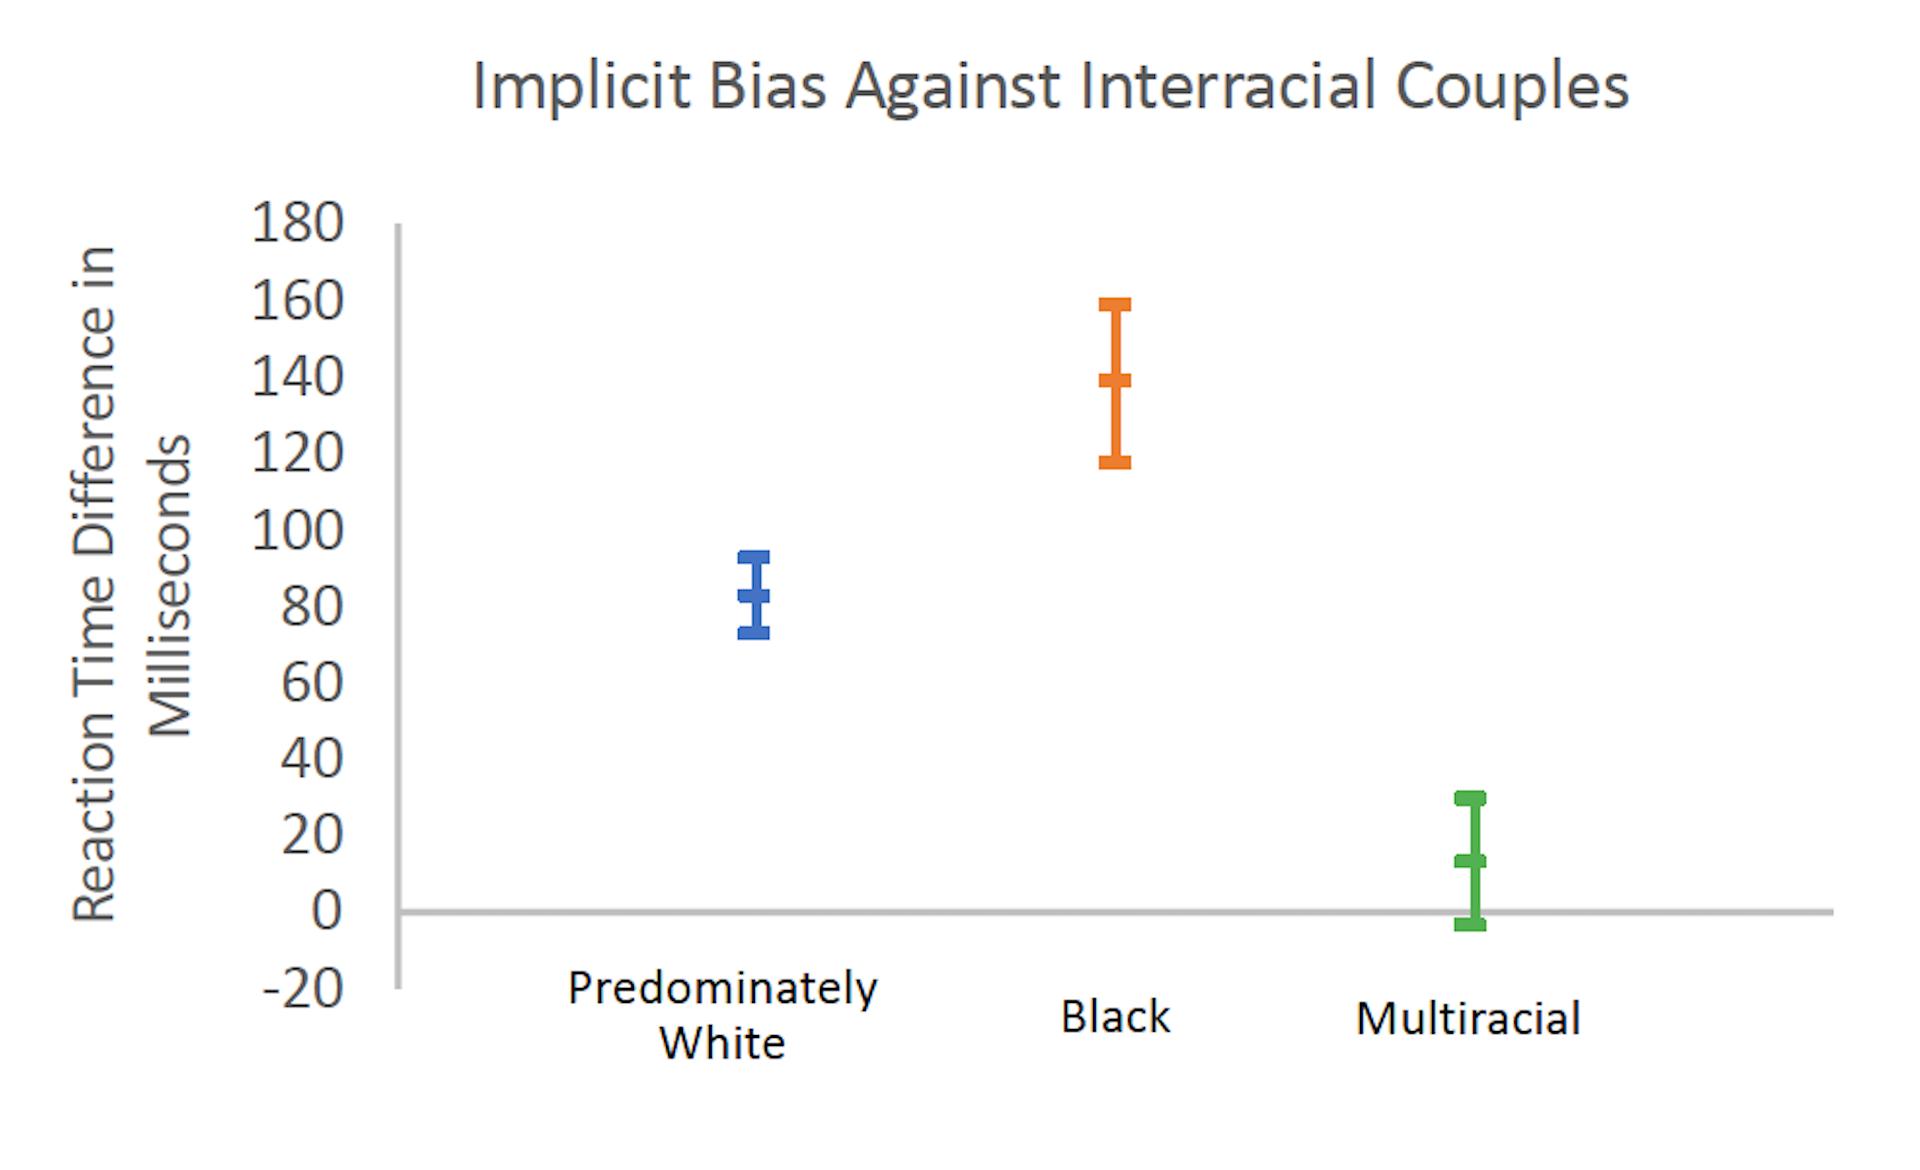 Interracial feels like